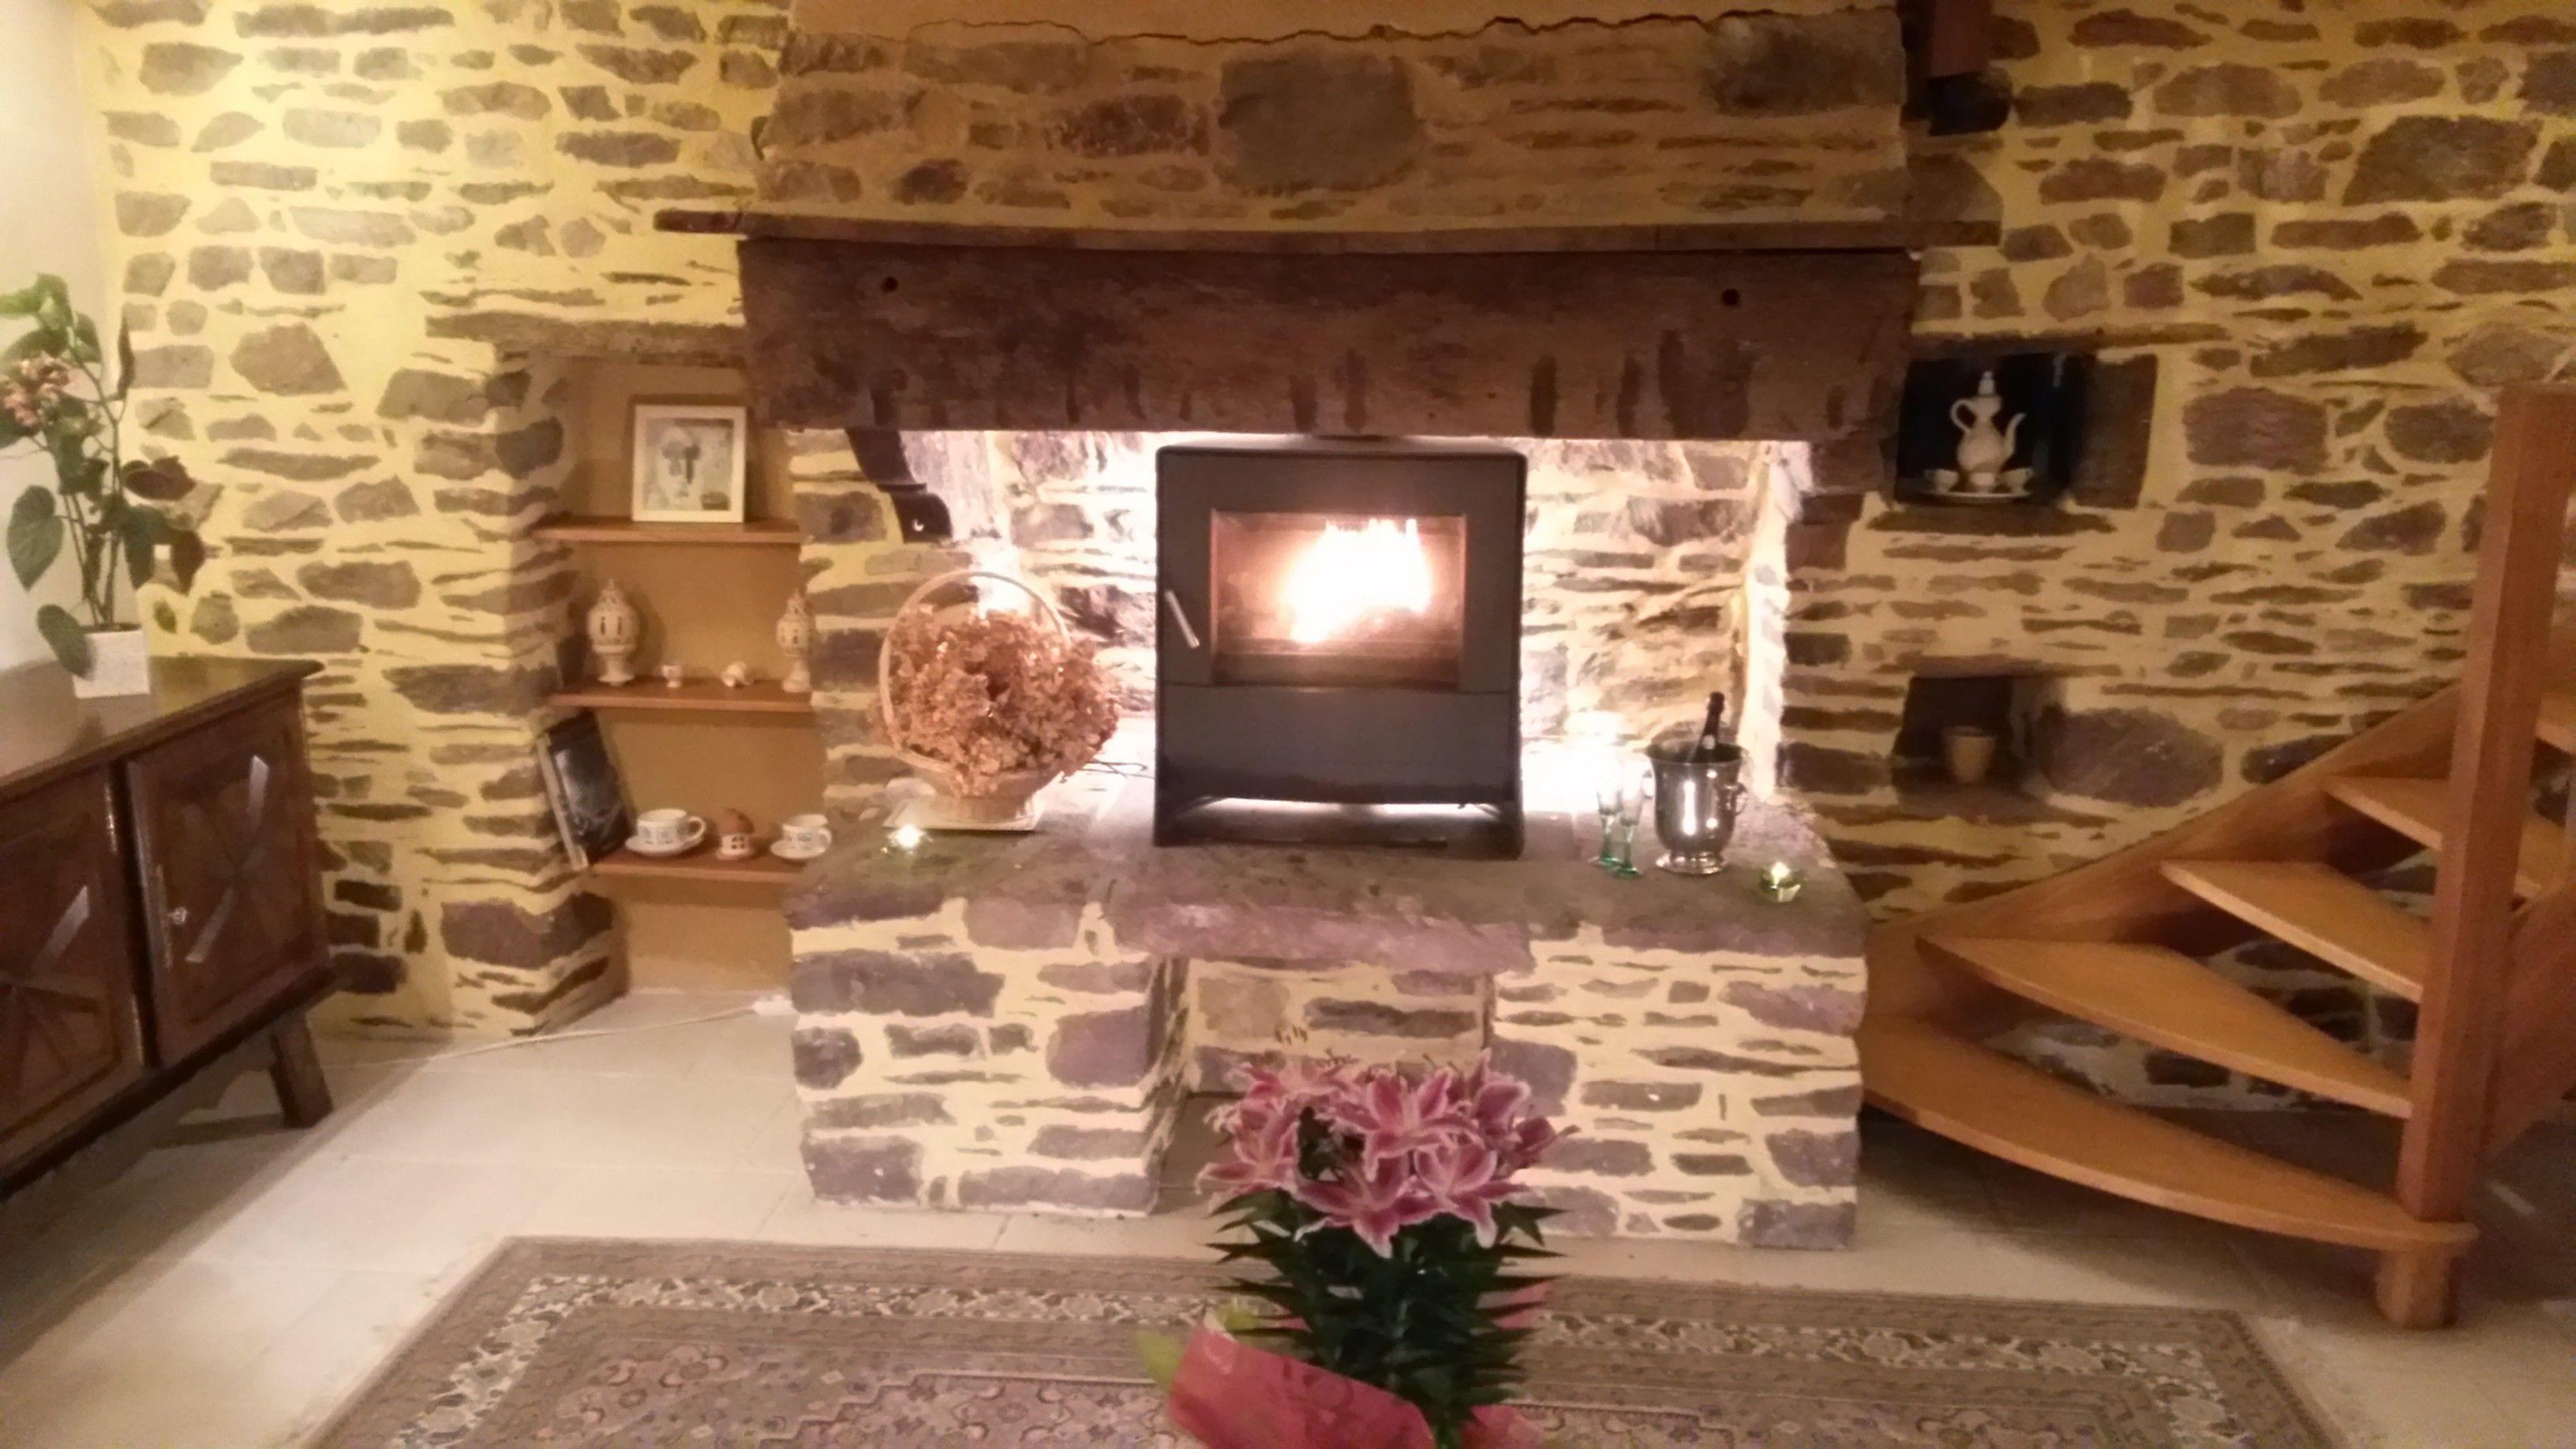 Venez vous reposer au salon, au coin du feu. The living-room and its relaxing fireplace.